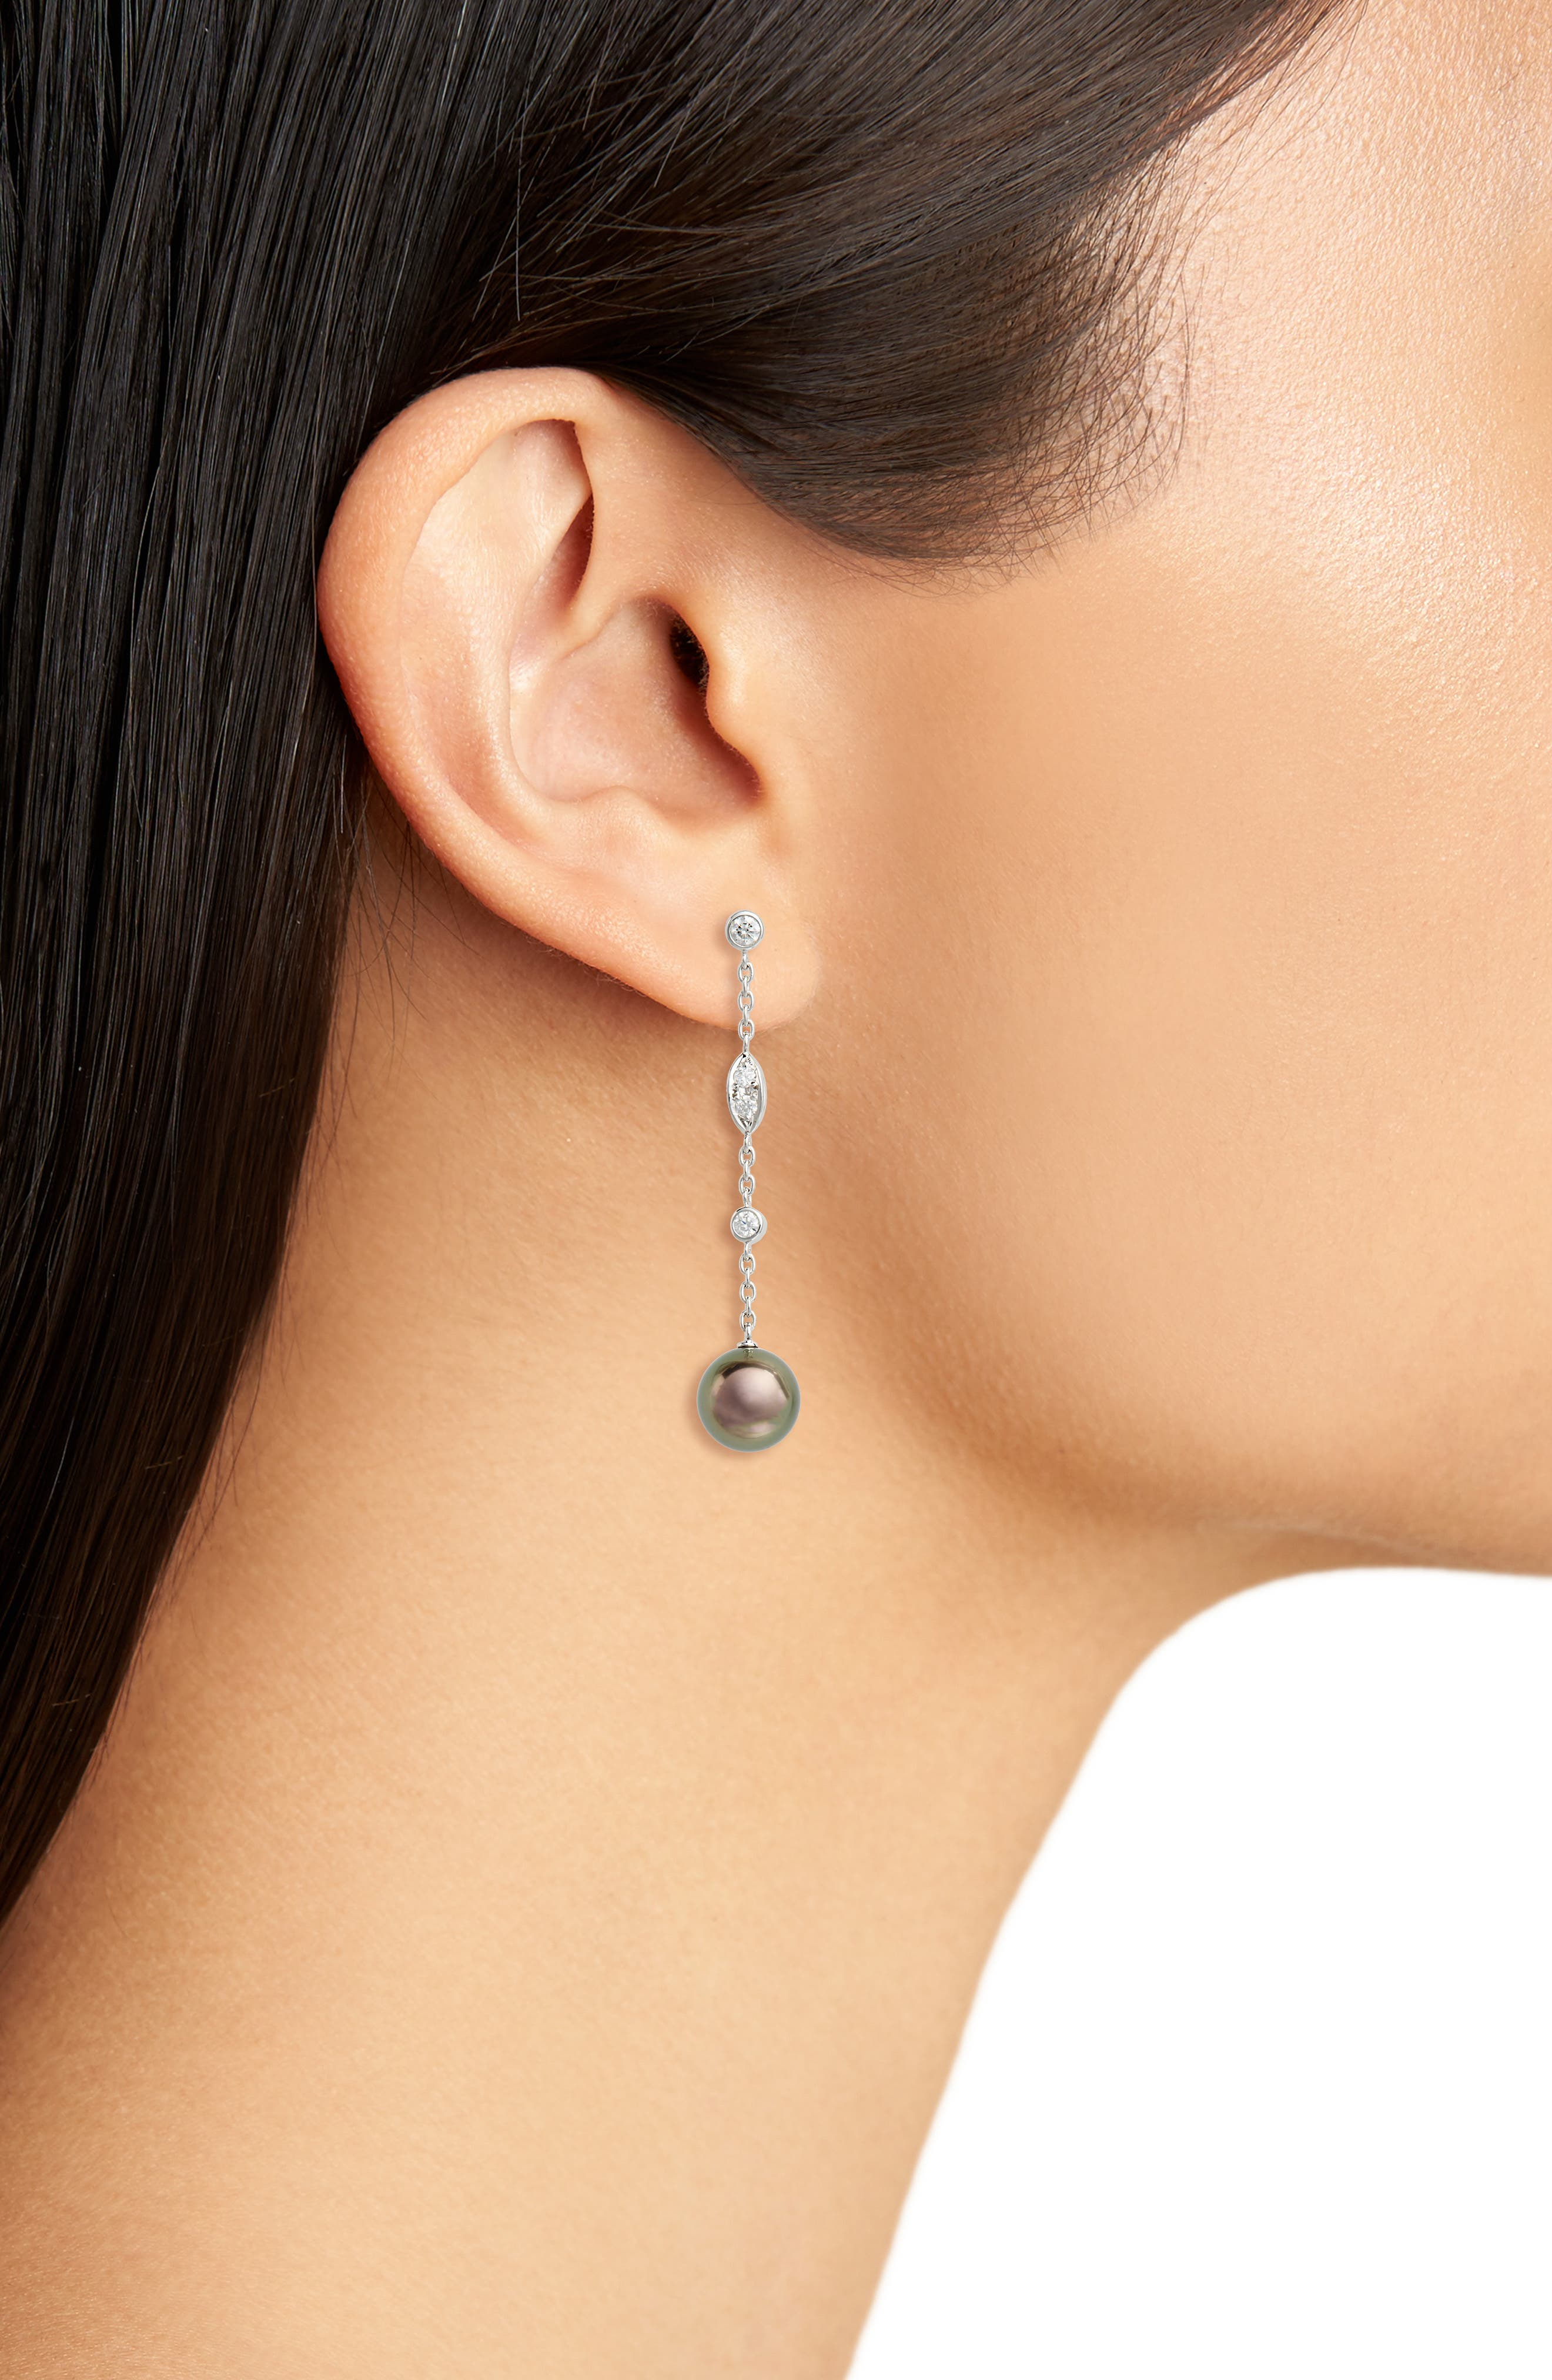 Black South Sea & Diamond Linear Drop Earrings,                             Alternate thumbnail 2, color,                             WHITE GOLD